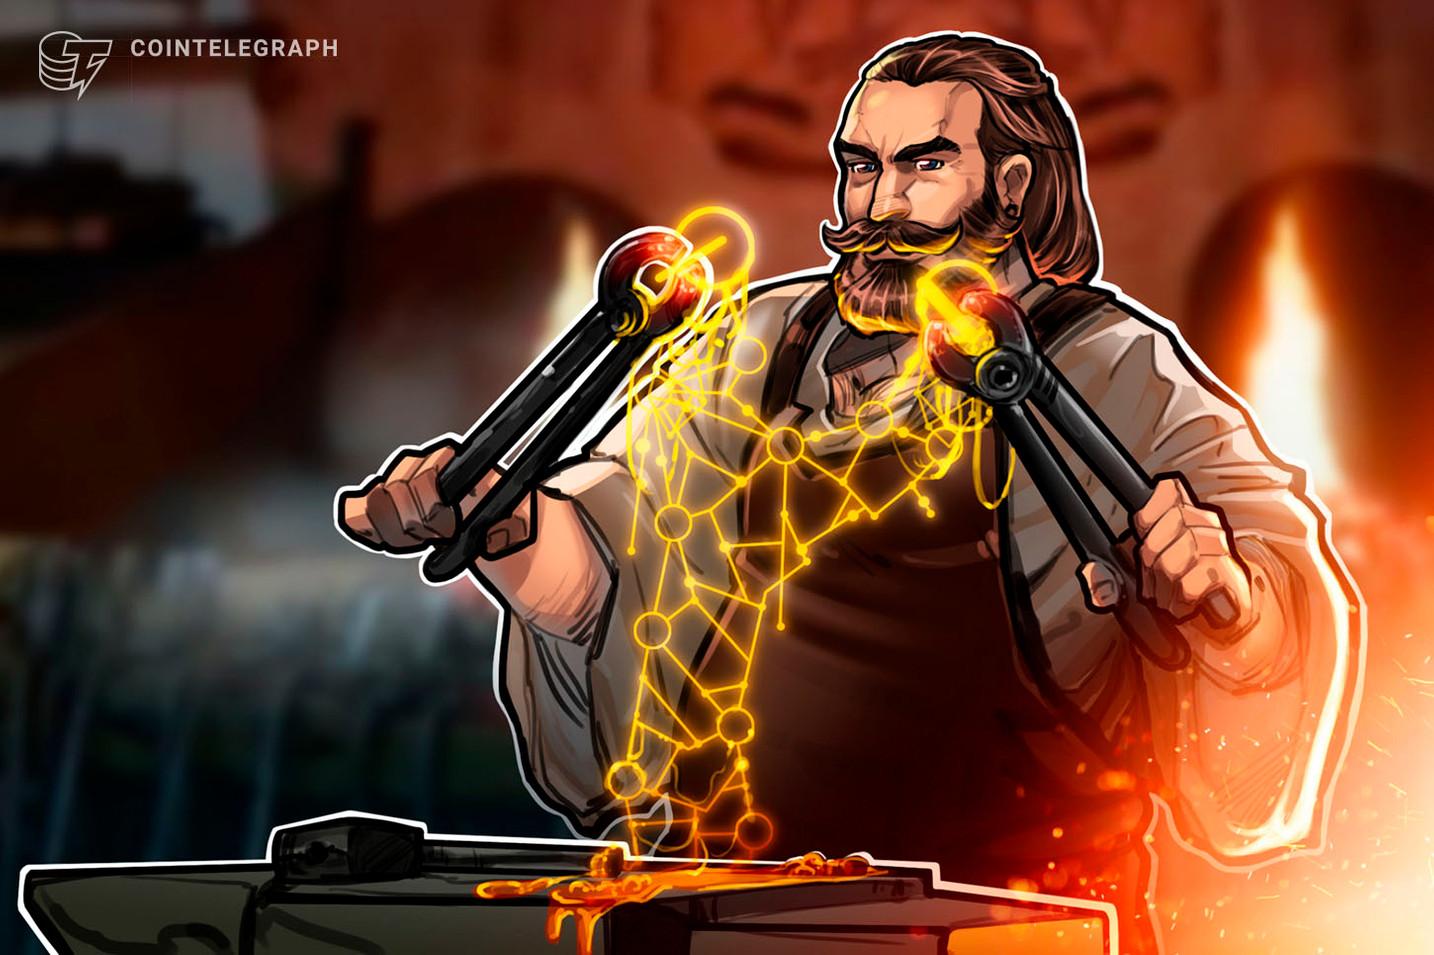 London Metals Exchange Endorses International Blockchain Initiative: FT